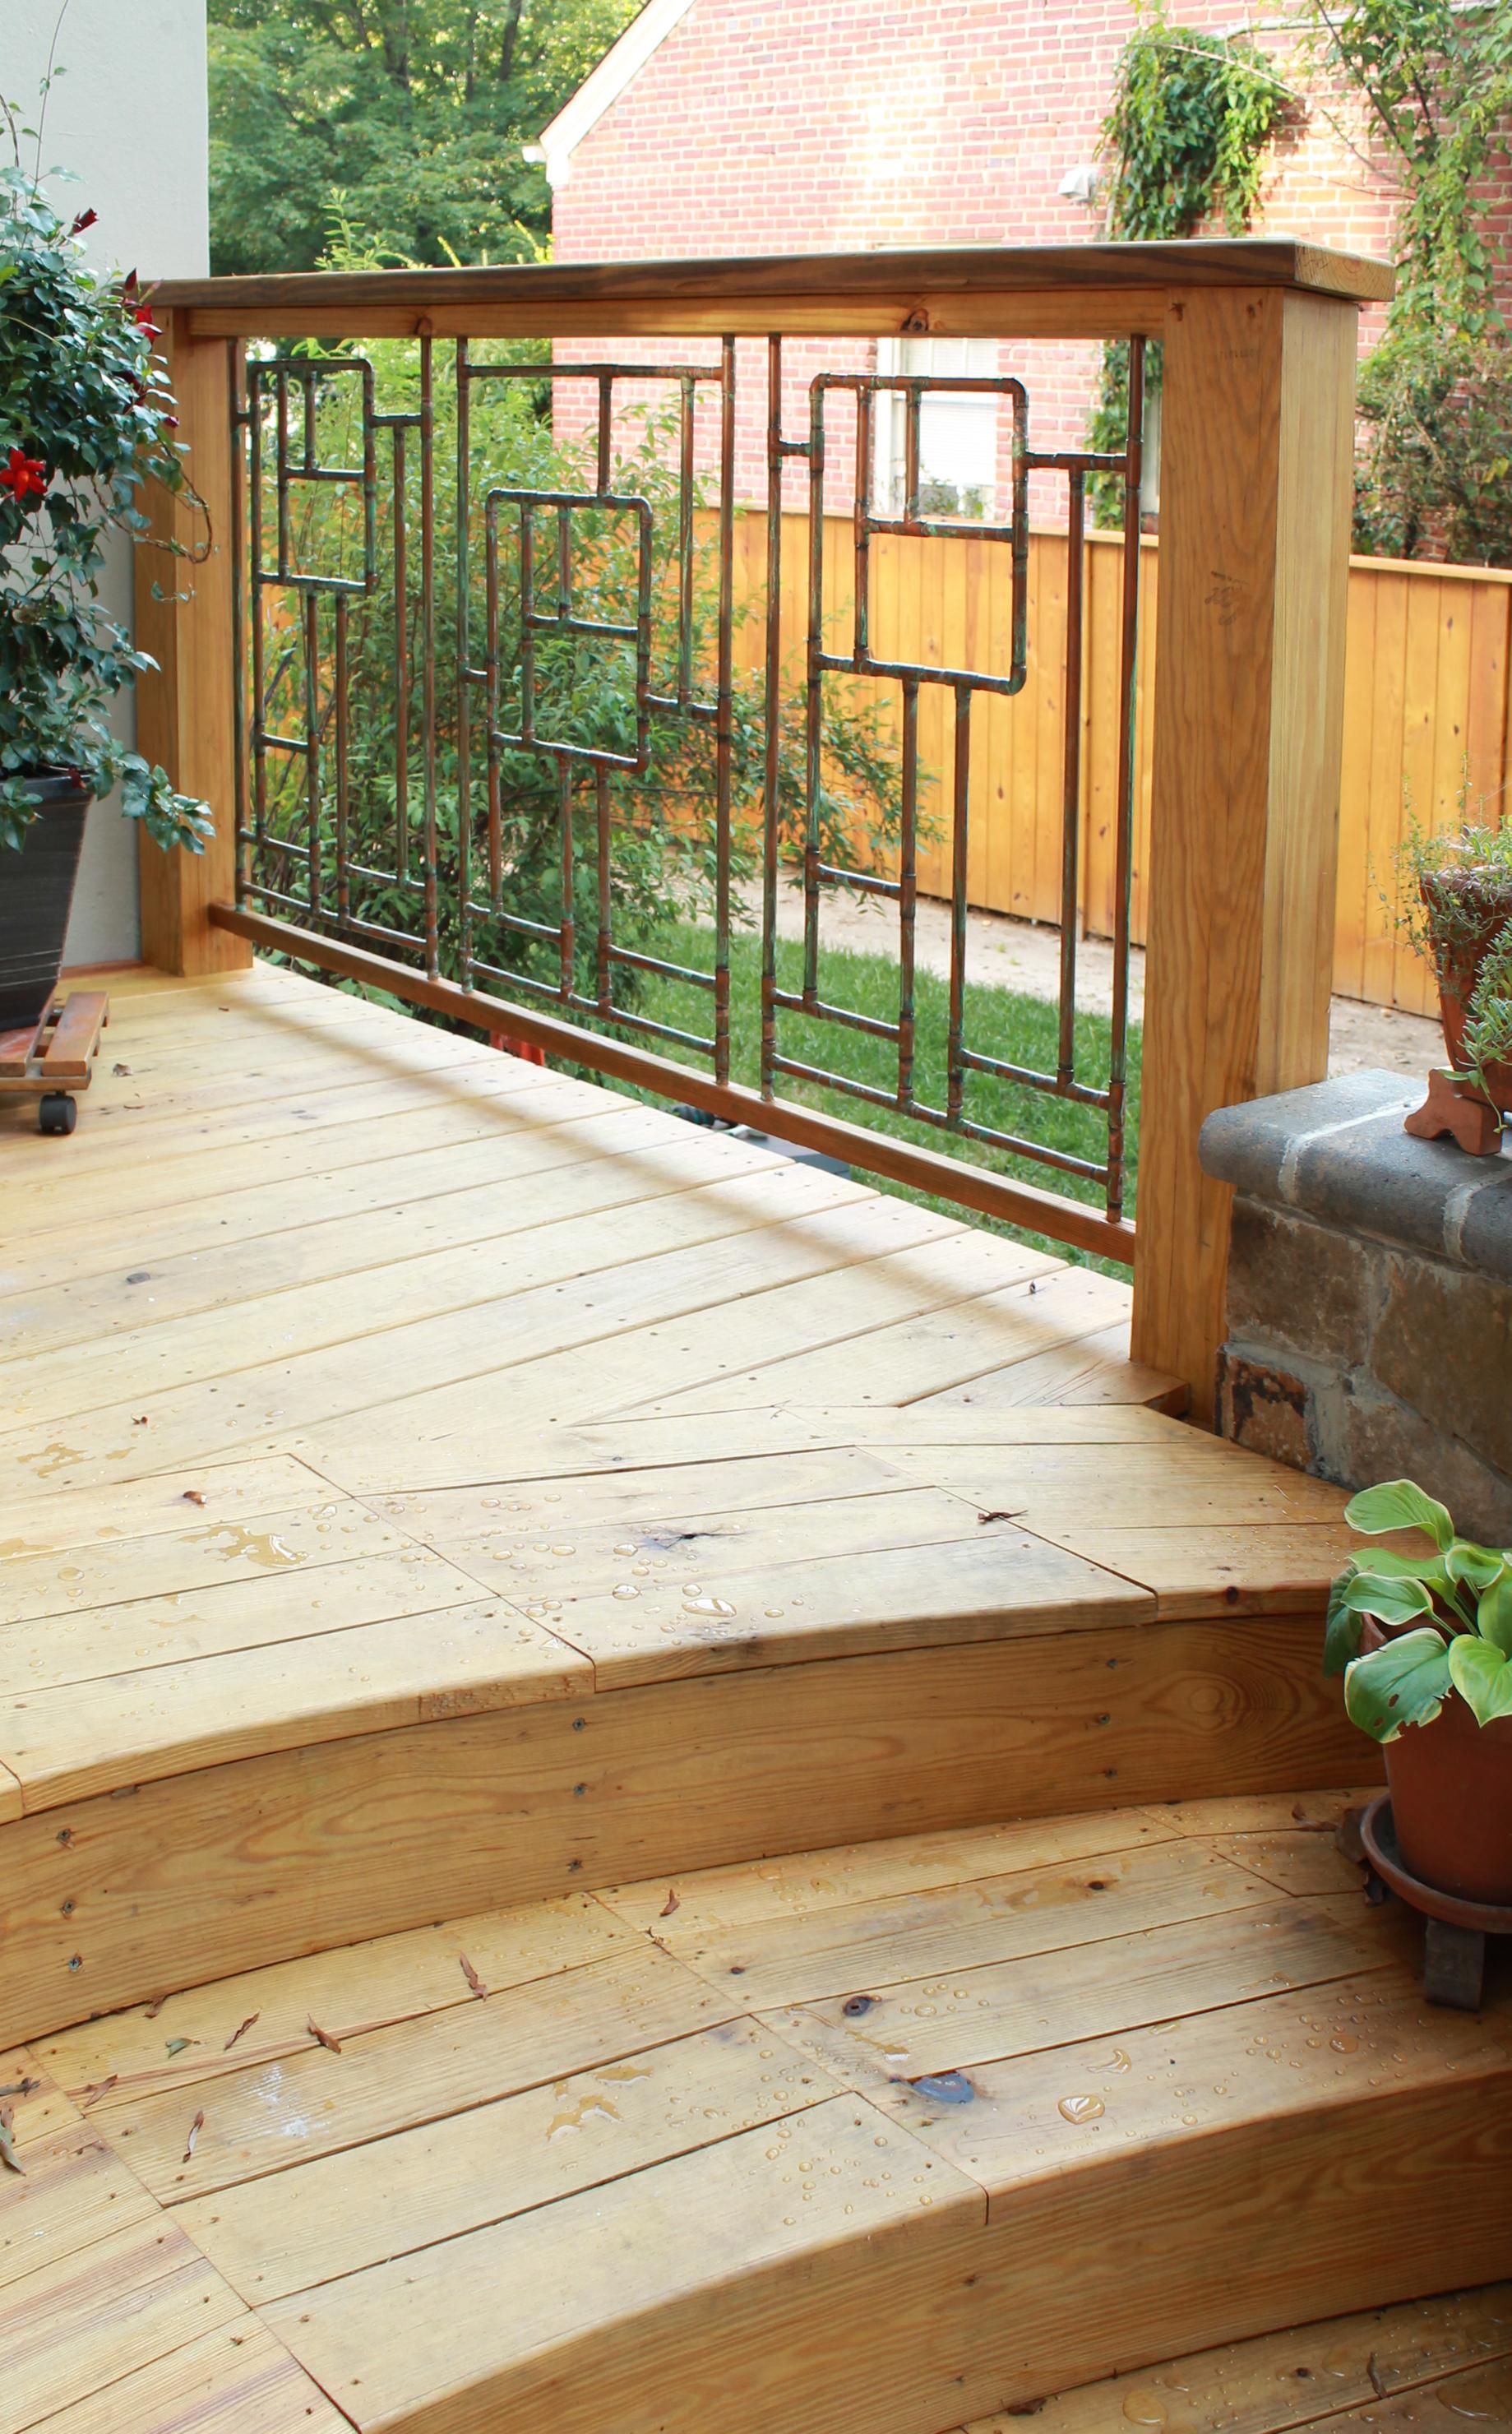 Copper railing inset